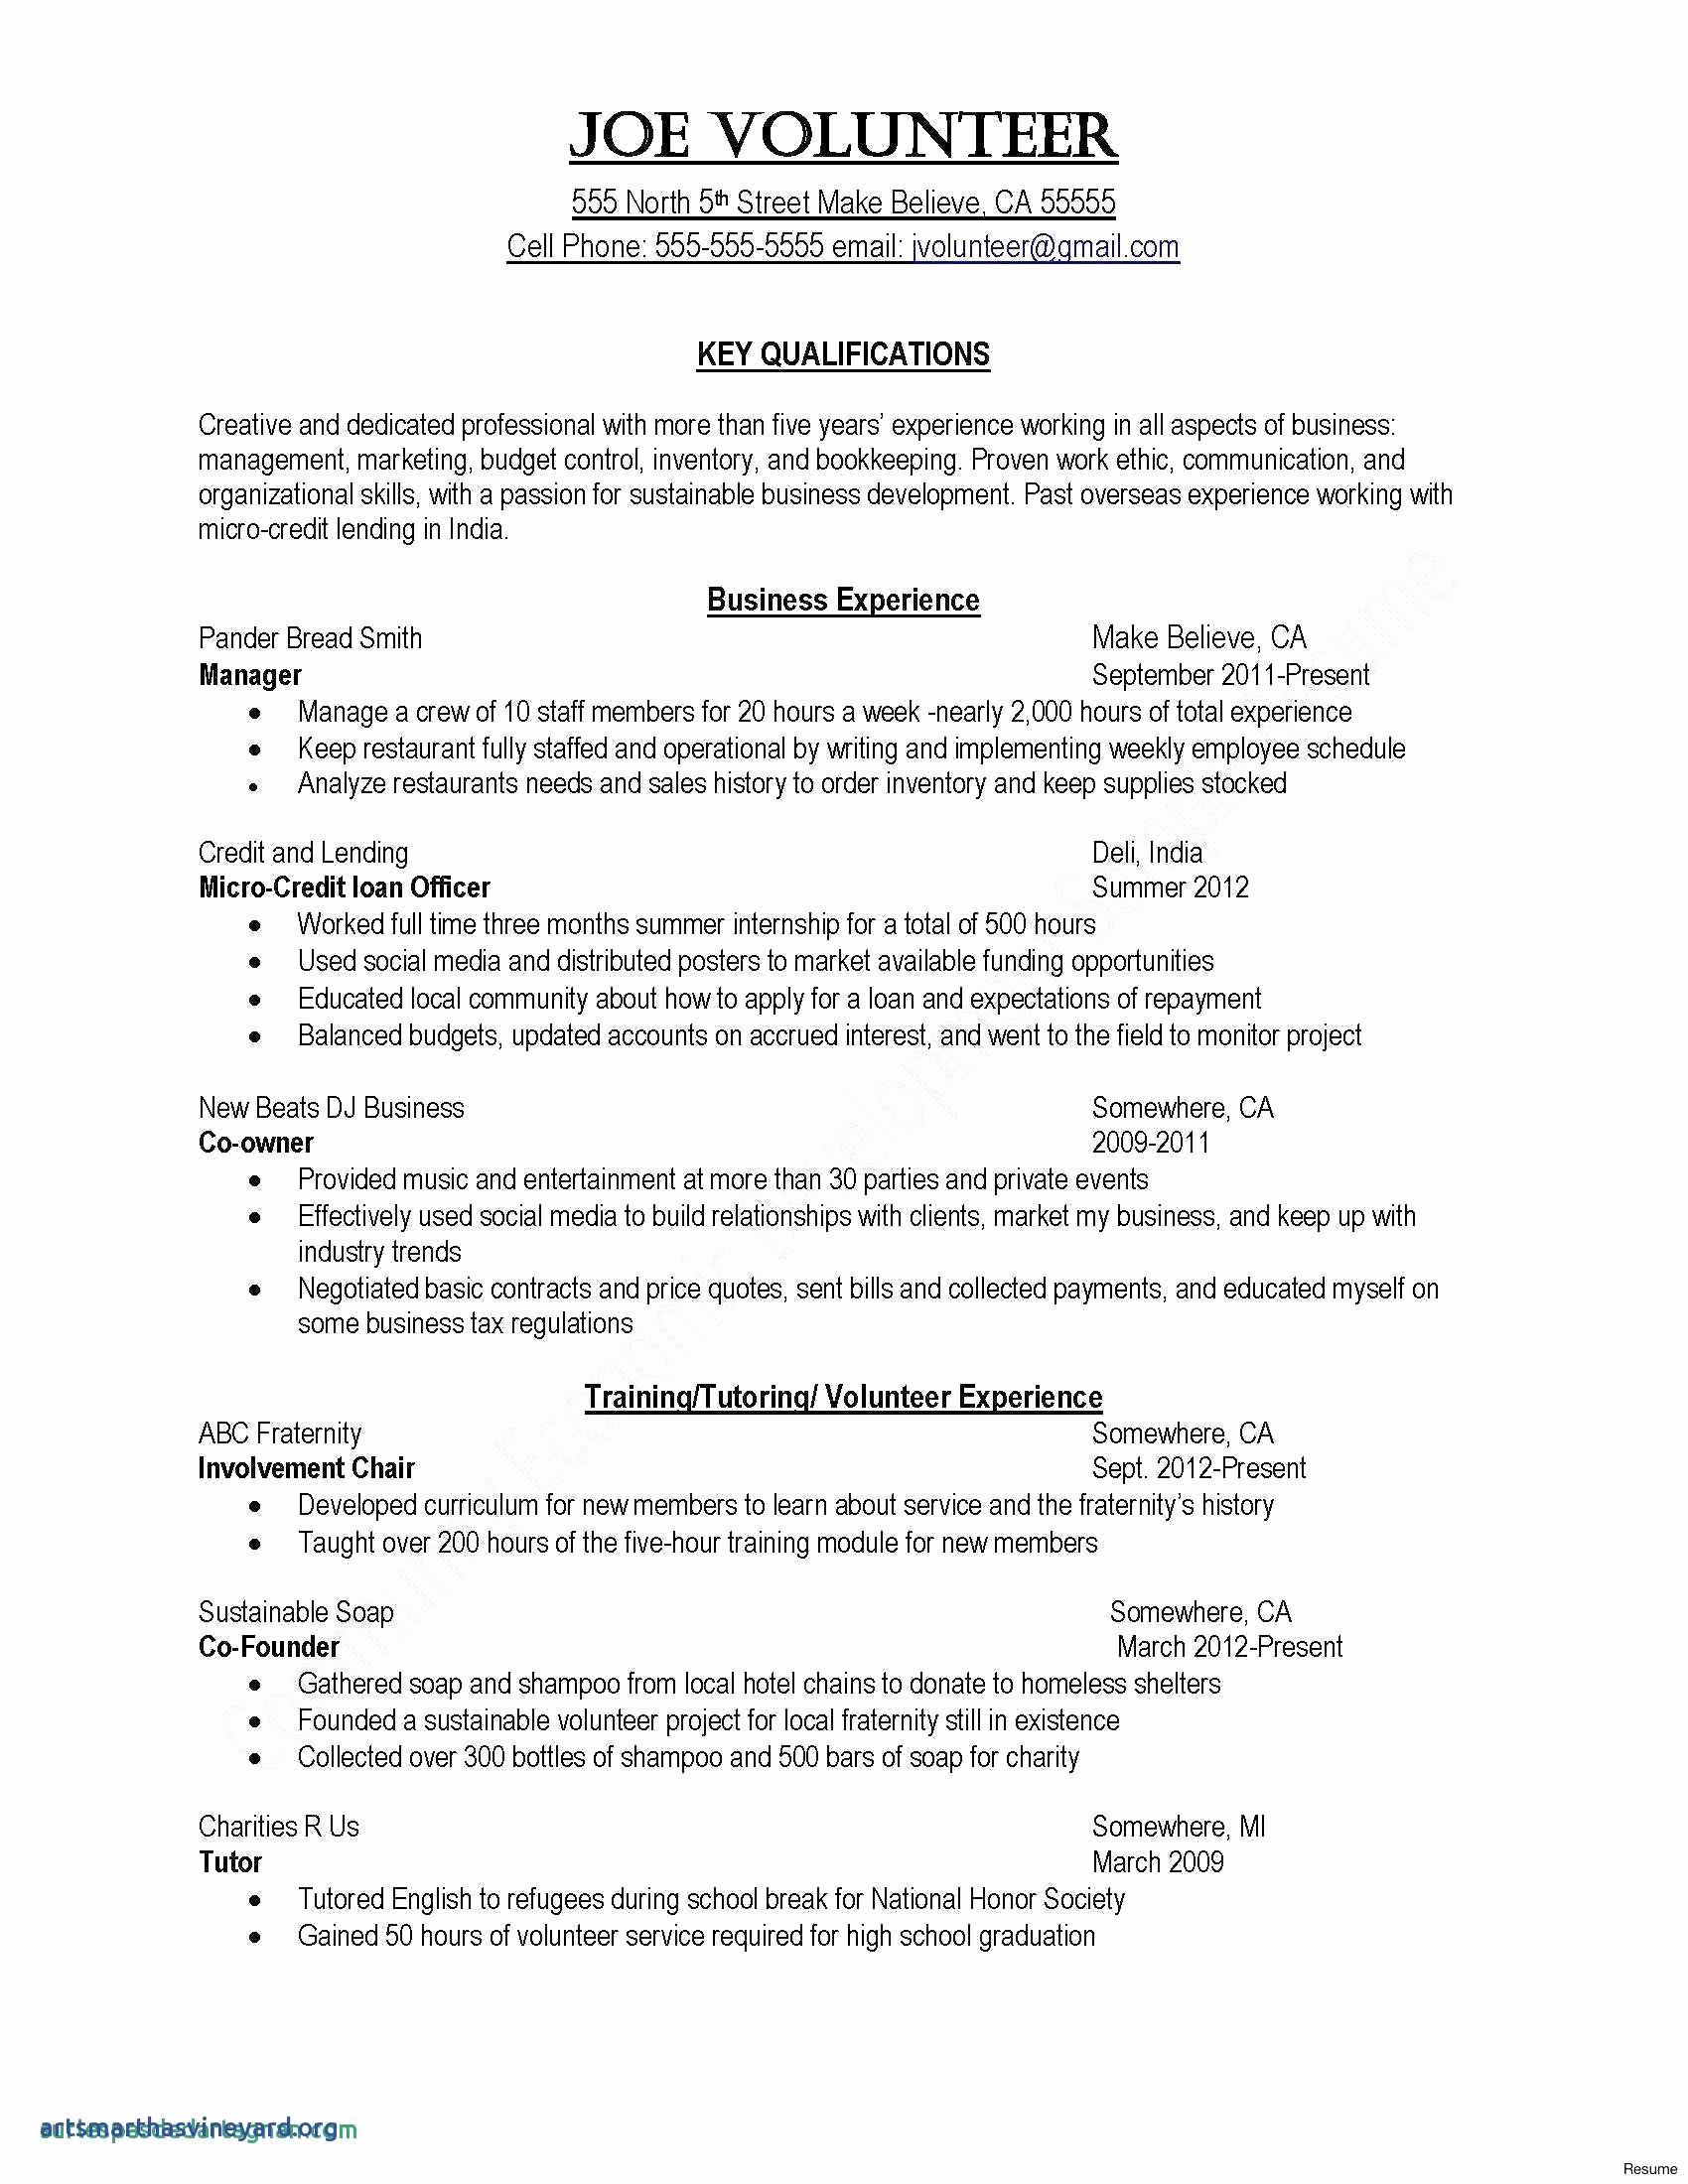 Florida Financial Affidavit Excel Spreadsheet Within Employee Training Log Template Fresh Weightlifting Excel Spreadsheet